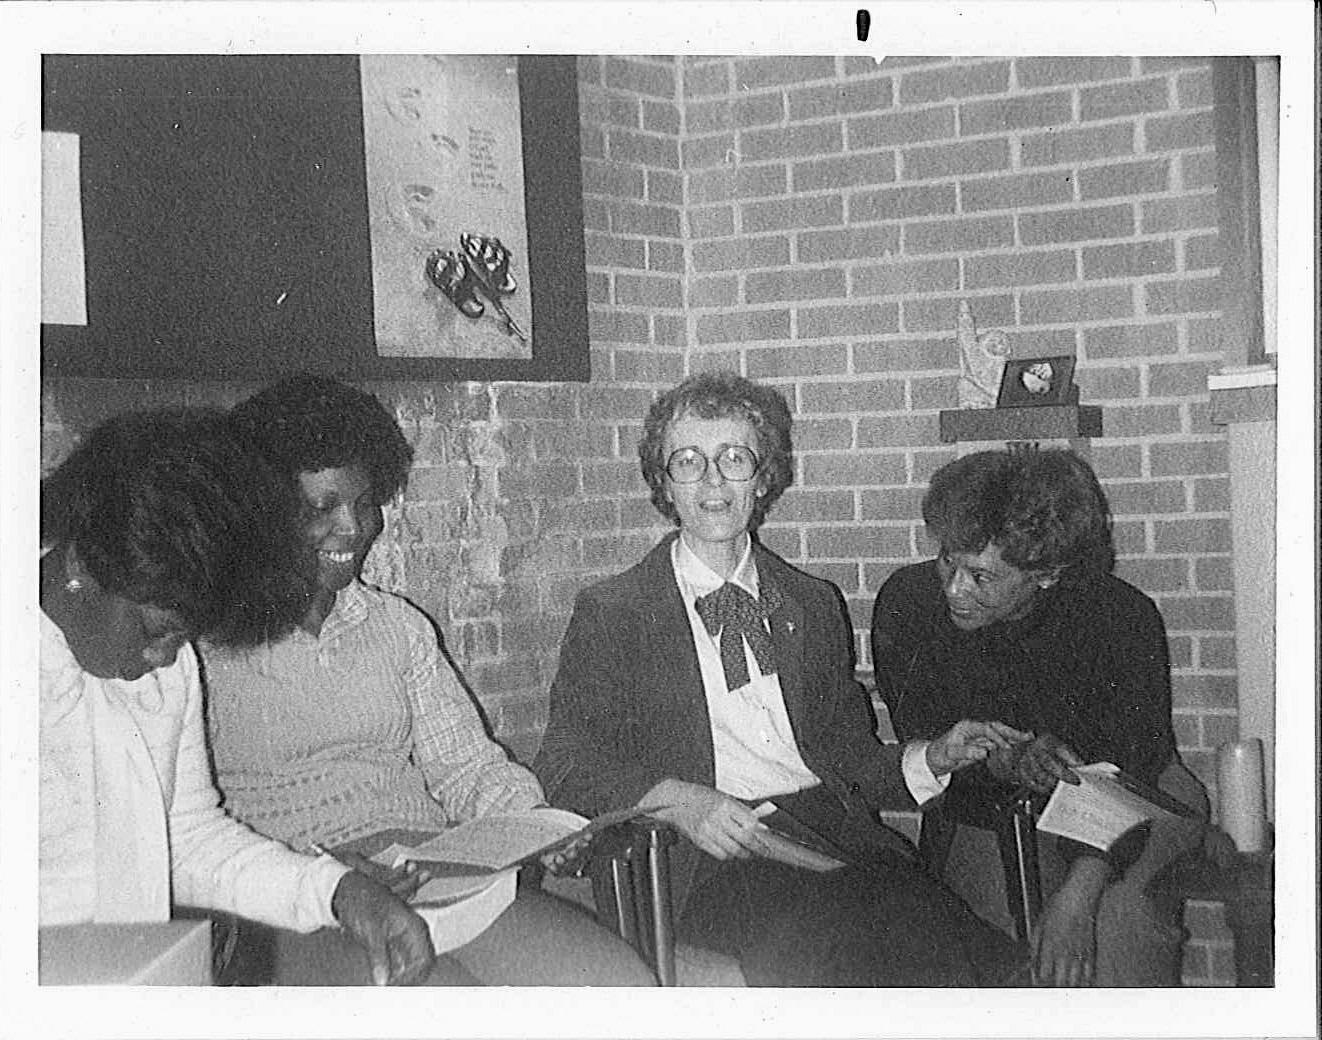 Sr. Joyce Ann Hertzig taught in t in